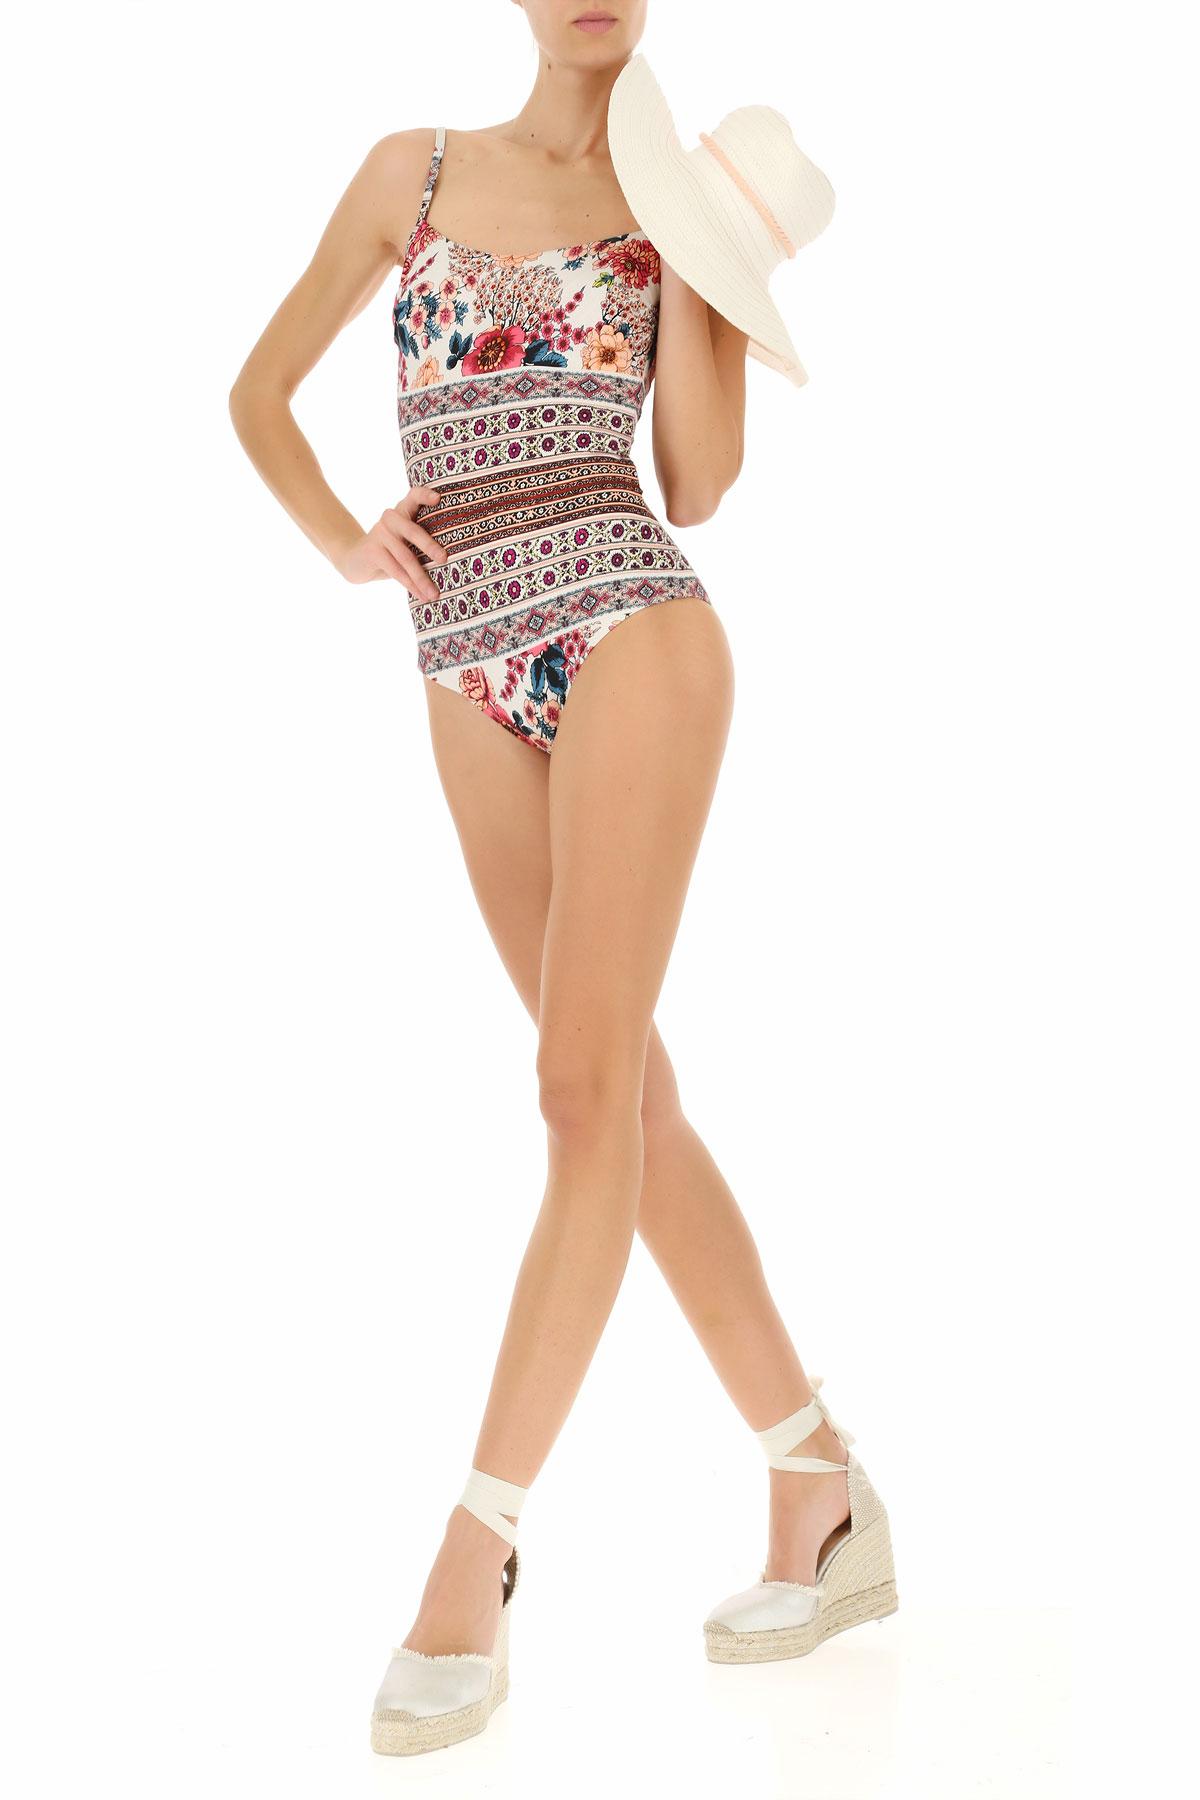 Mujer Simona Set Rosa Anémona Blanco Ropa By Twin 2019 verano Barbieri Primavera Para nbsp;turquesa xYP6Fn